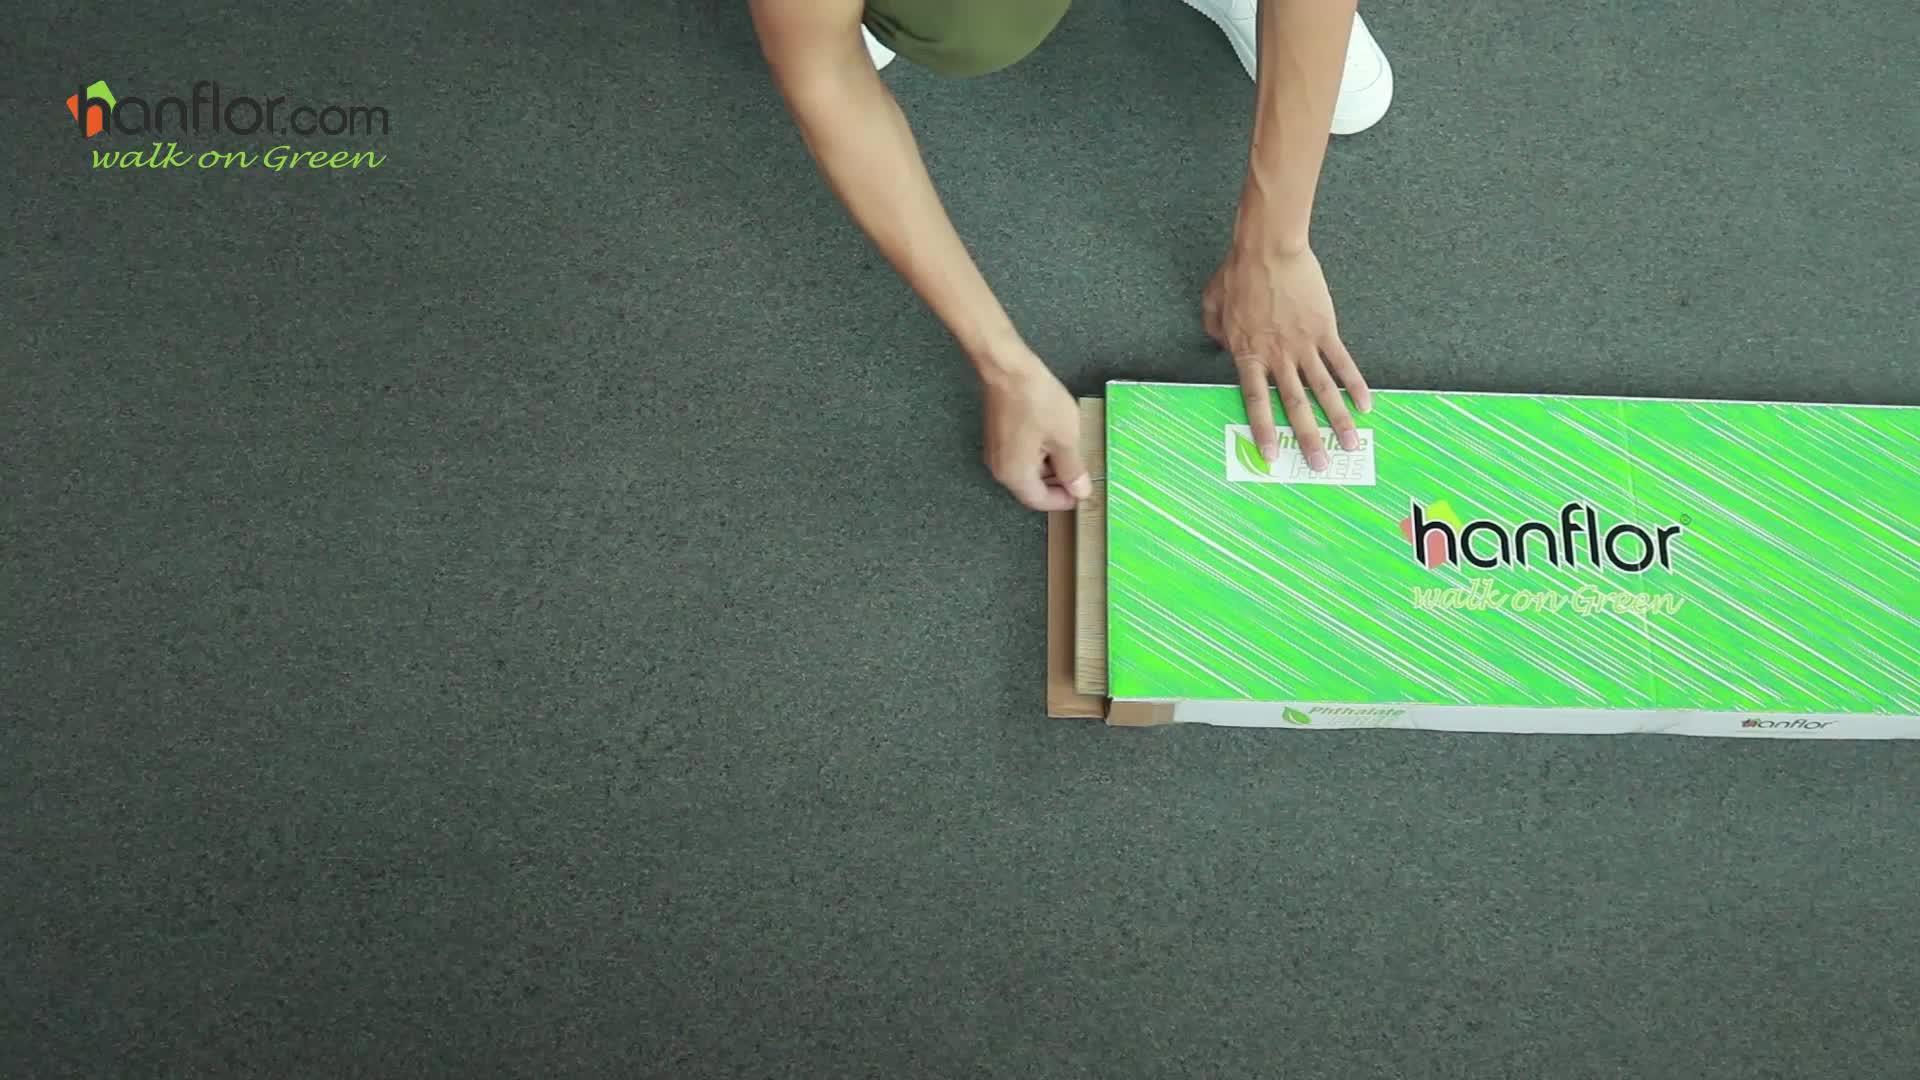 Eco 4mm Click Flooring System LVT Luxury Vinyl Plank